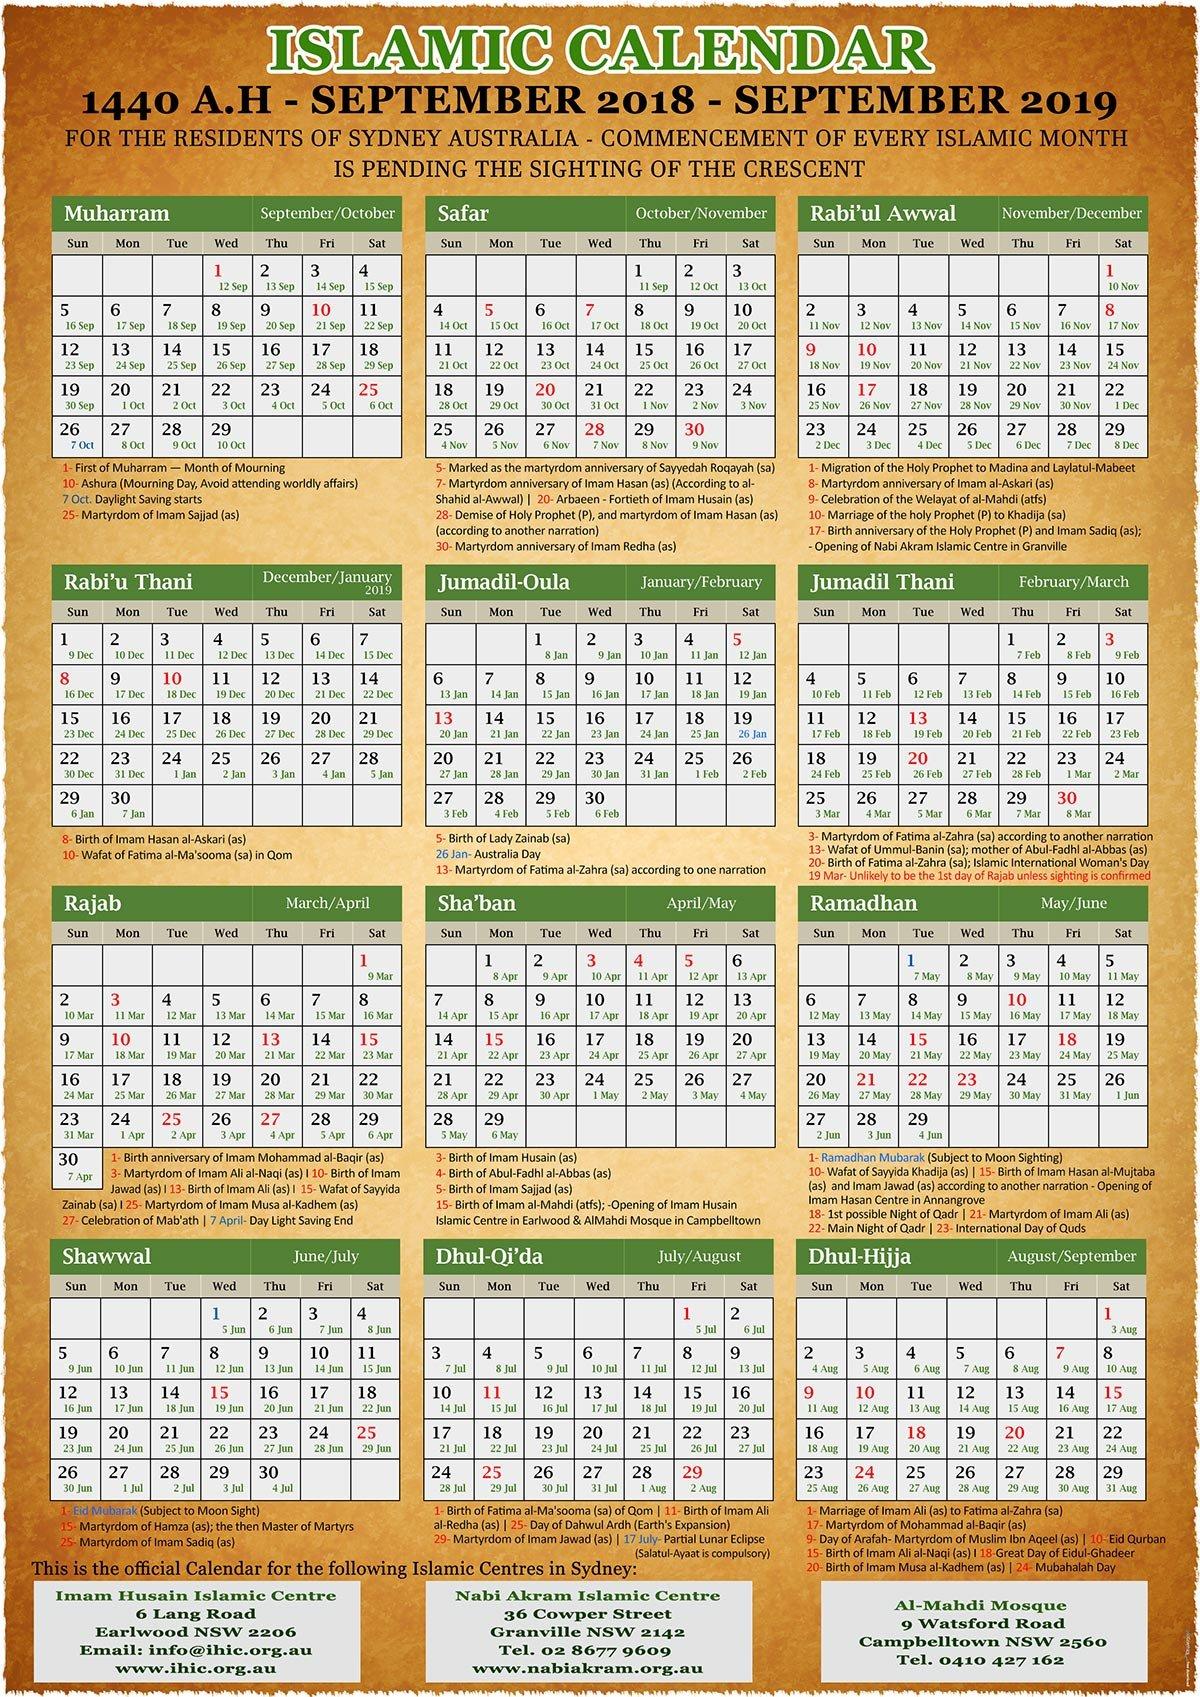 Annual Islamic Calendar 1440 A.h. (2019) – Imam Husain Islamic Centre 2019 Calendar 1440